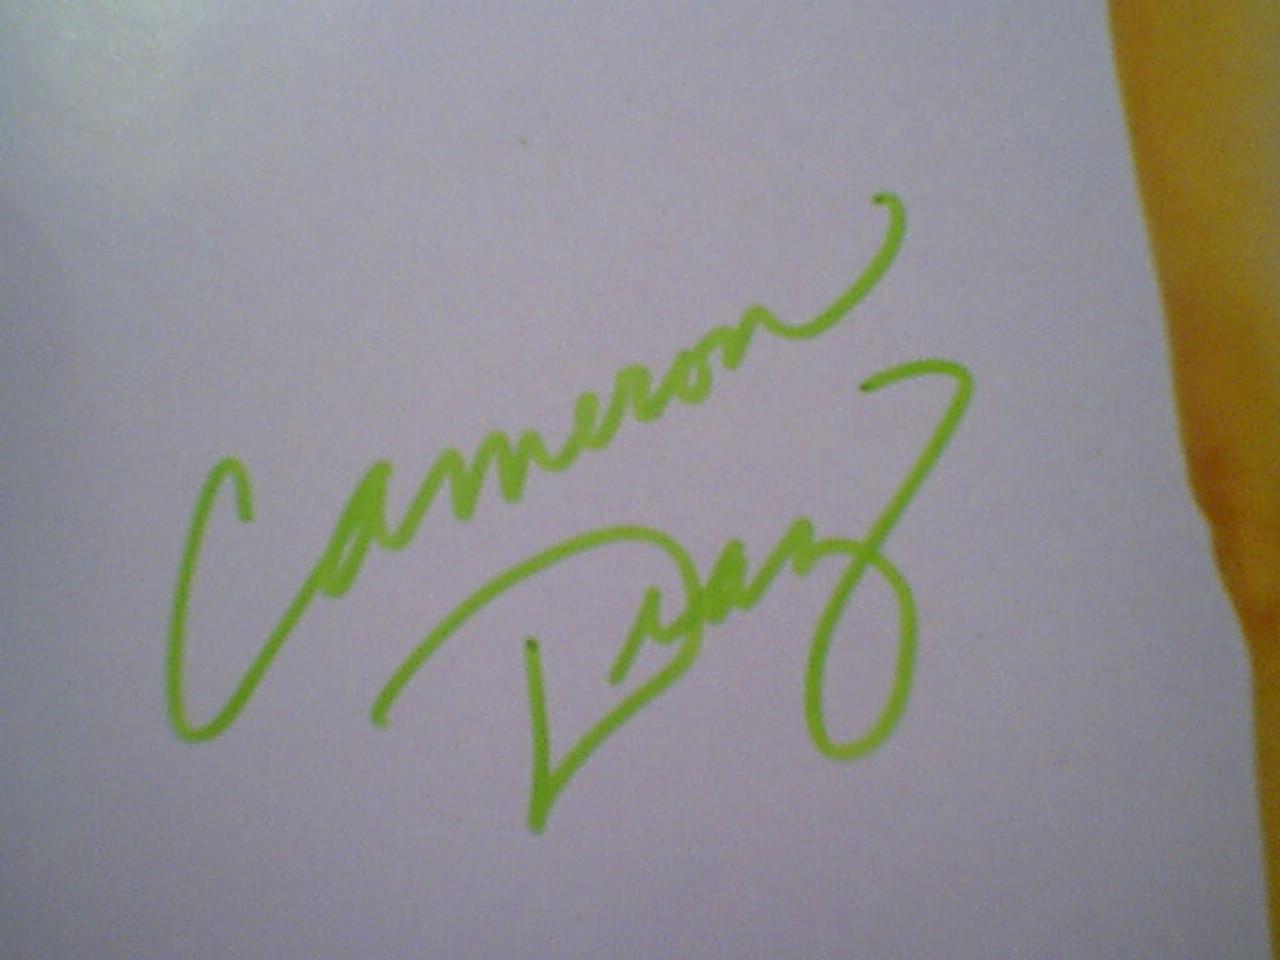 Diaz, Cameron Color Photo Signed Autograph Cheesecake